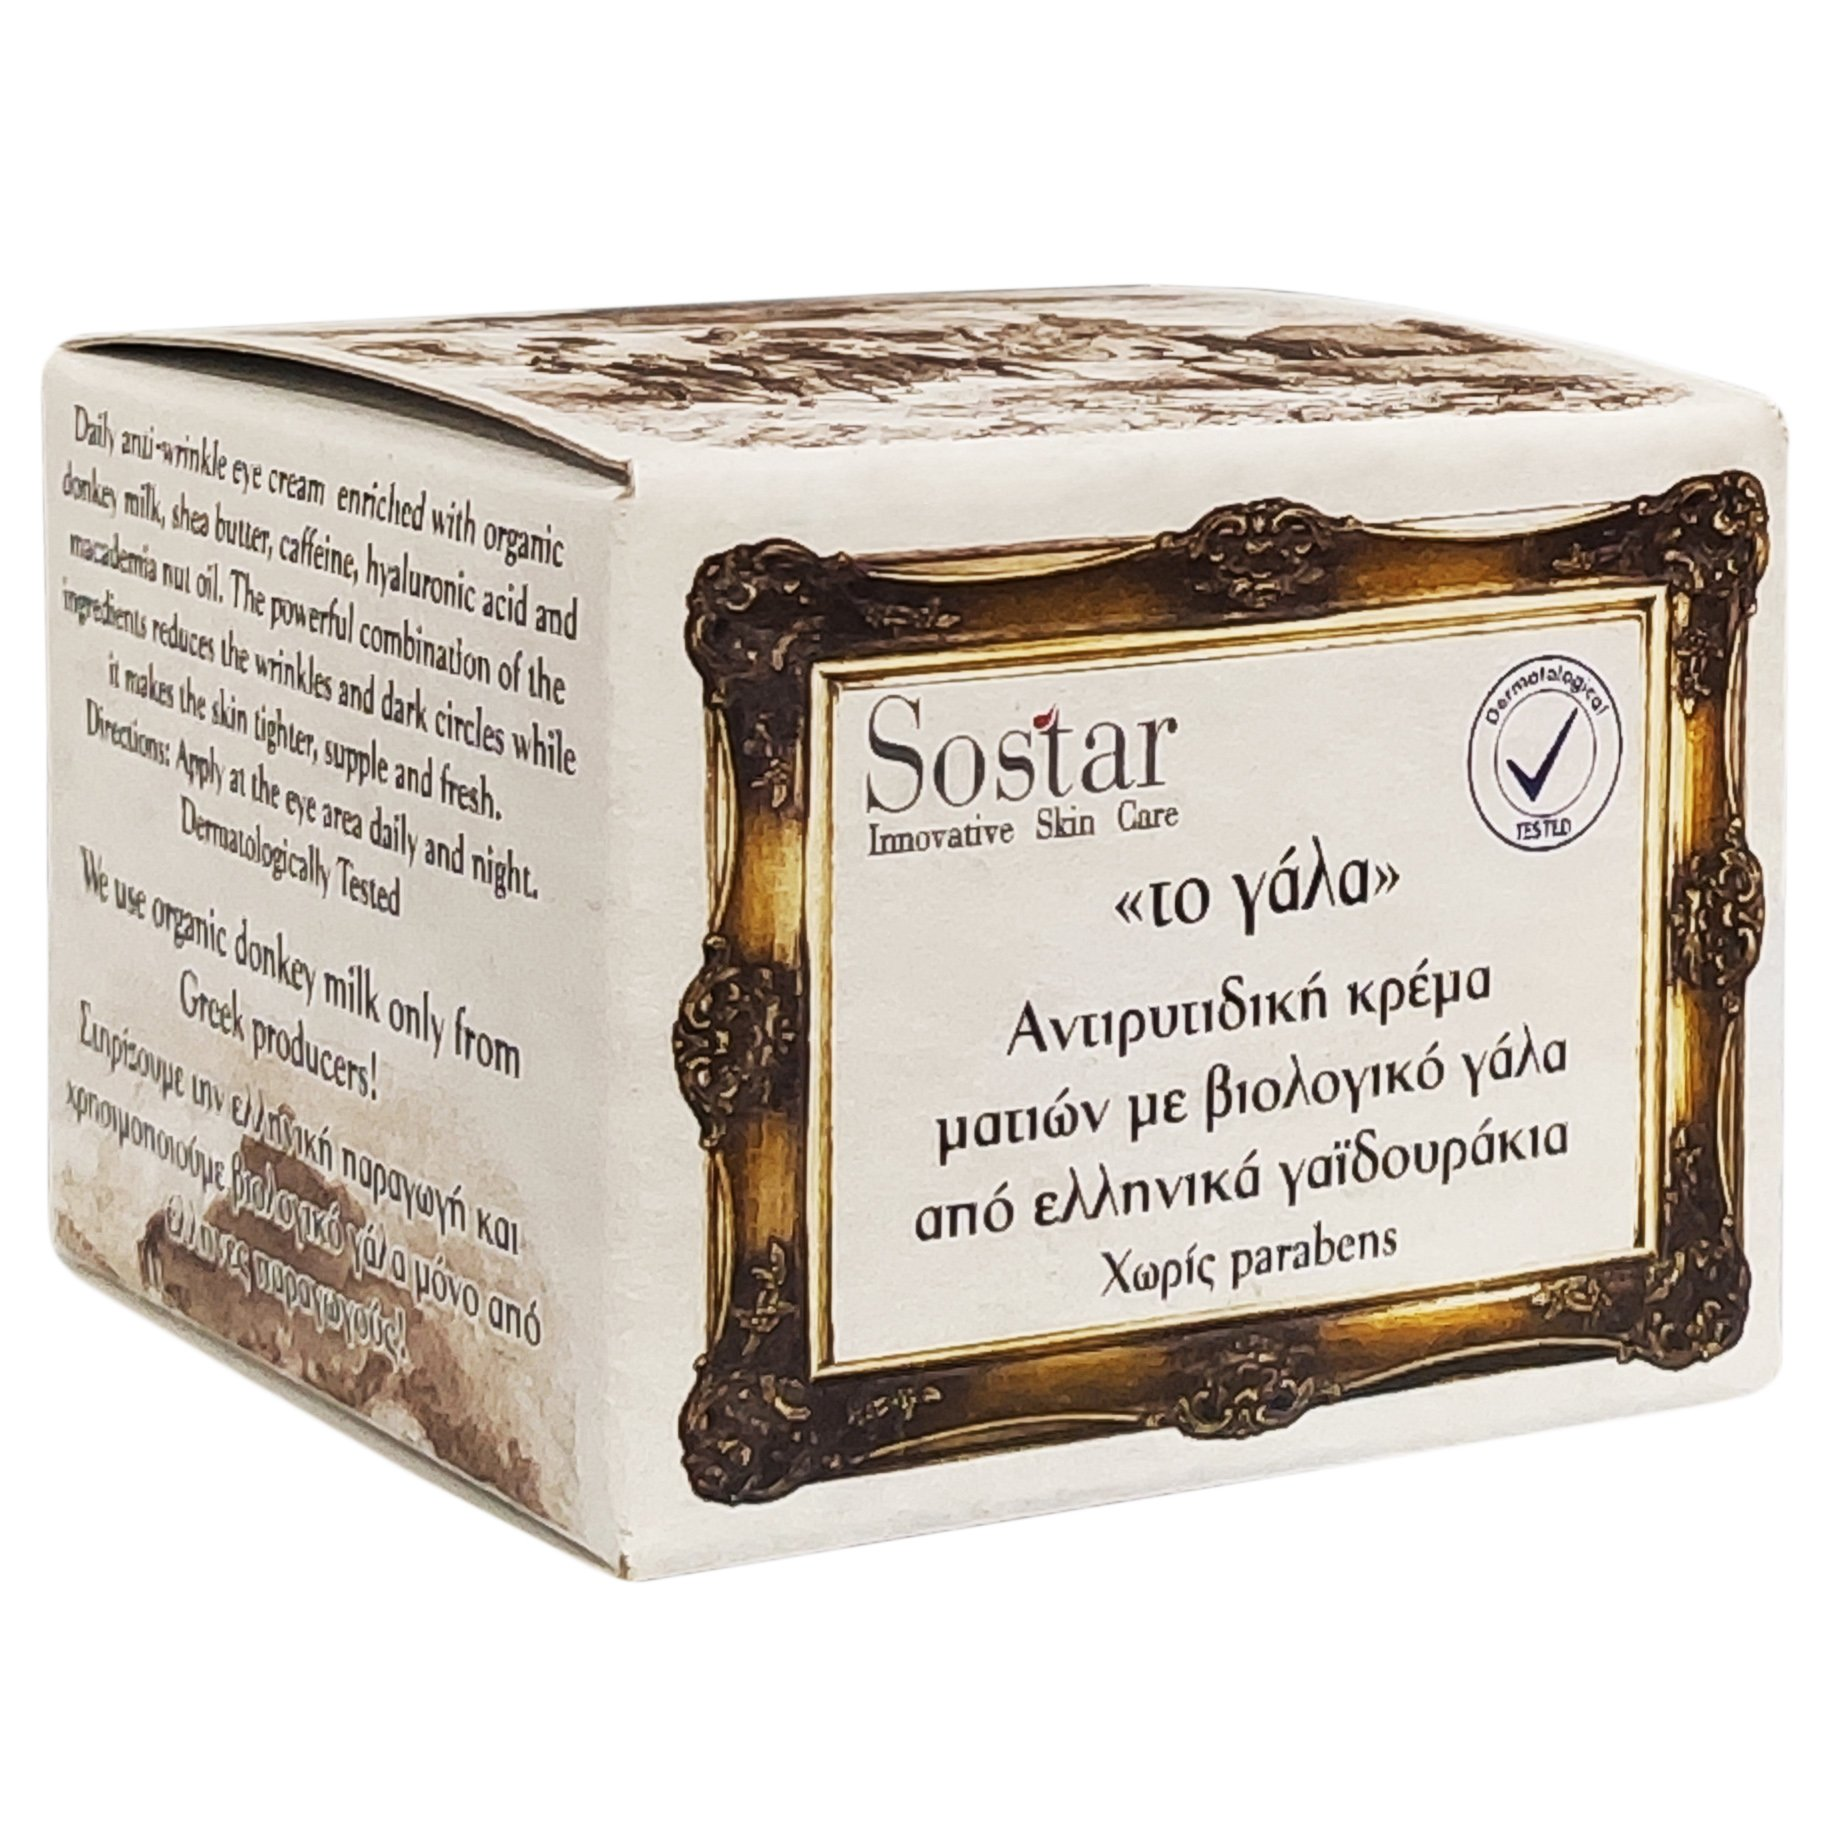 Sostar Αντιγηραντική Κρέμα Ματιών με Γάλα Γαιδούρας 30ml